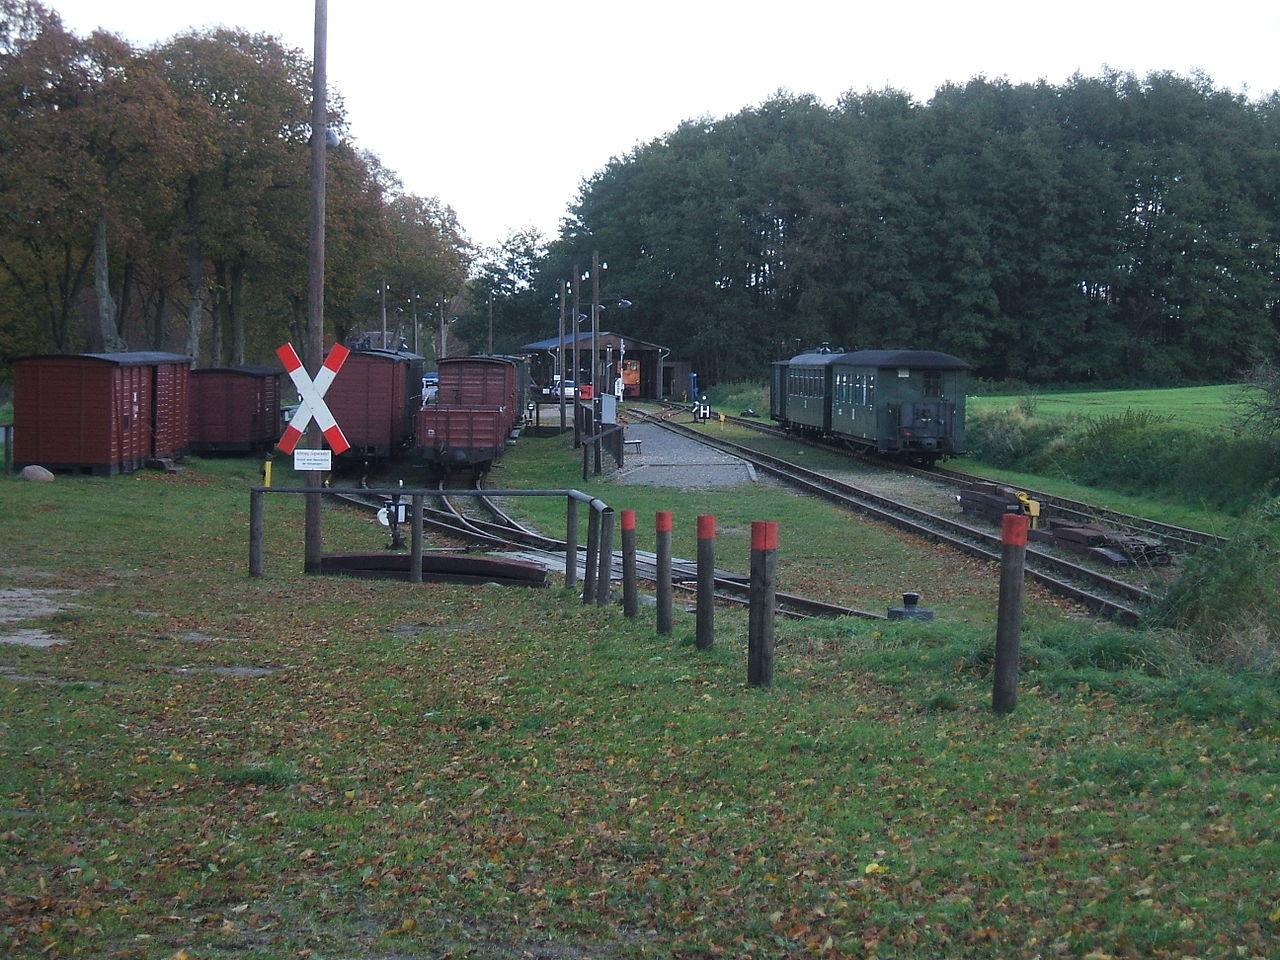 Bild Kleinbahnmuseum Lindenberg Prignitz